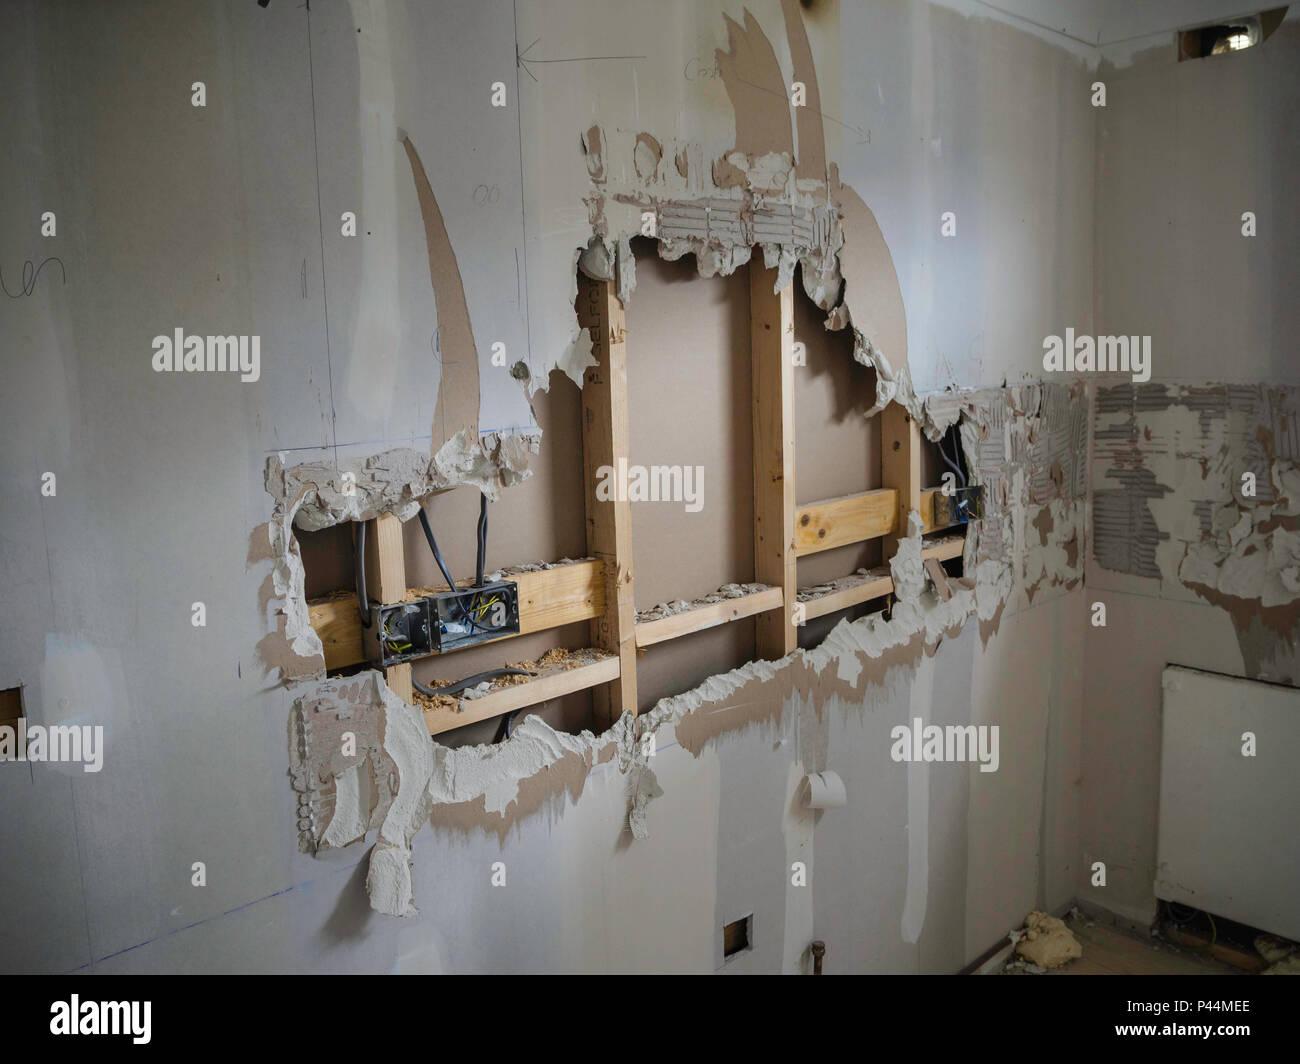 Plasterboard Walls Stockfotos & Plasterboard Walls Bilder - Alamy